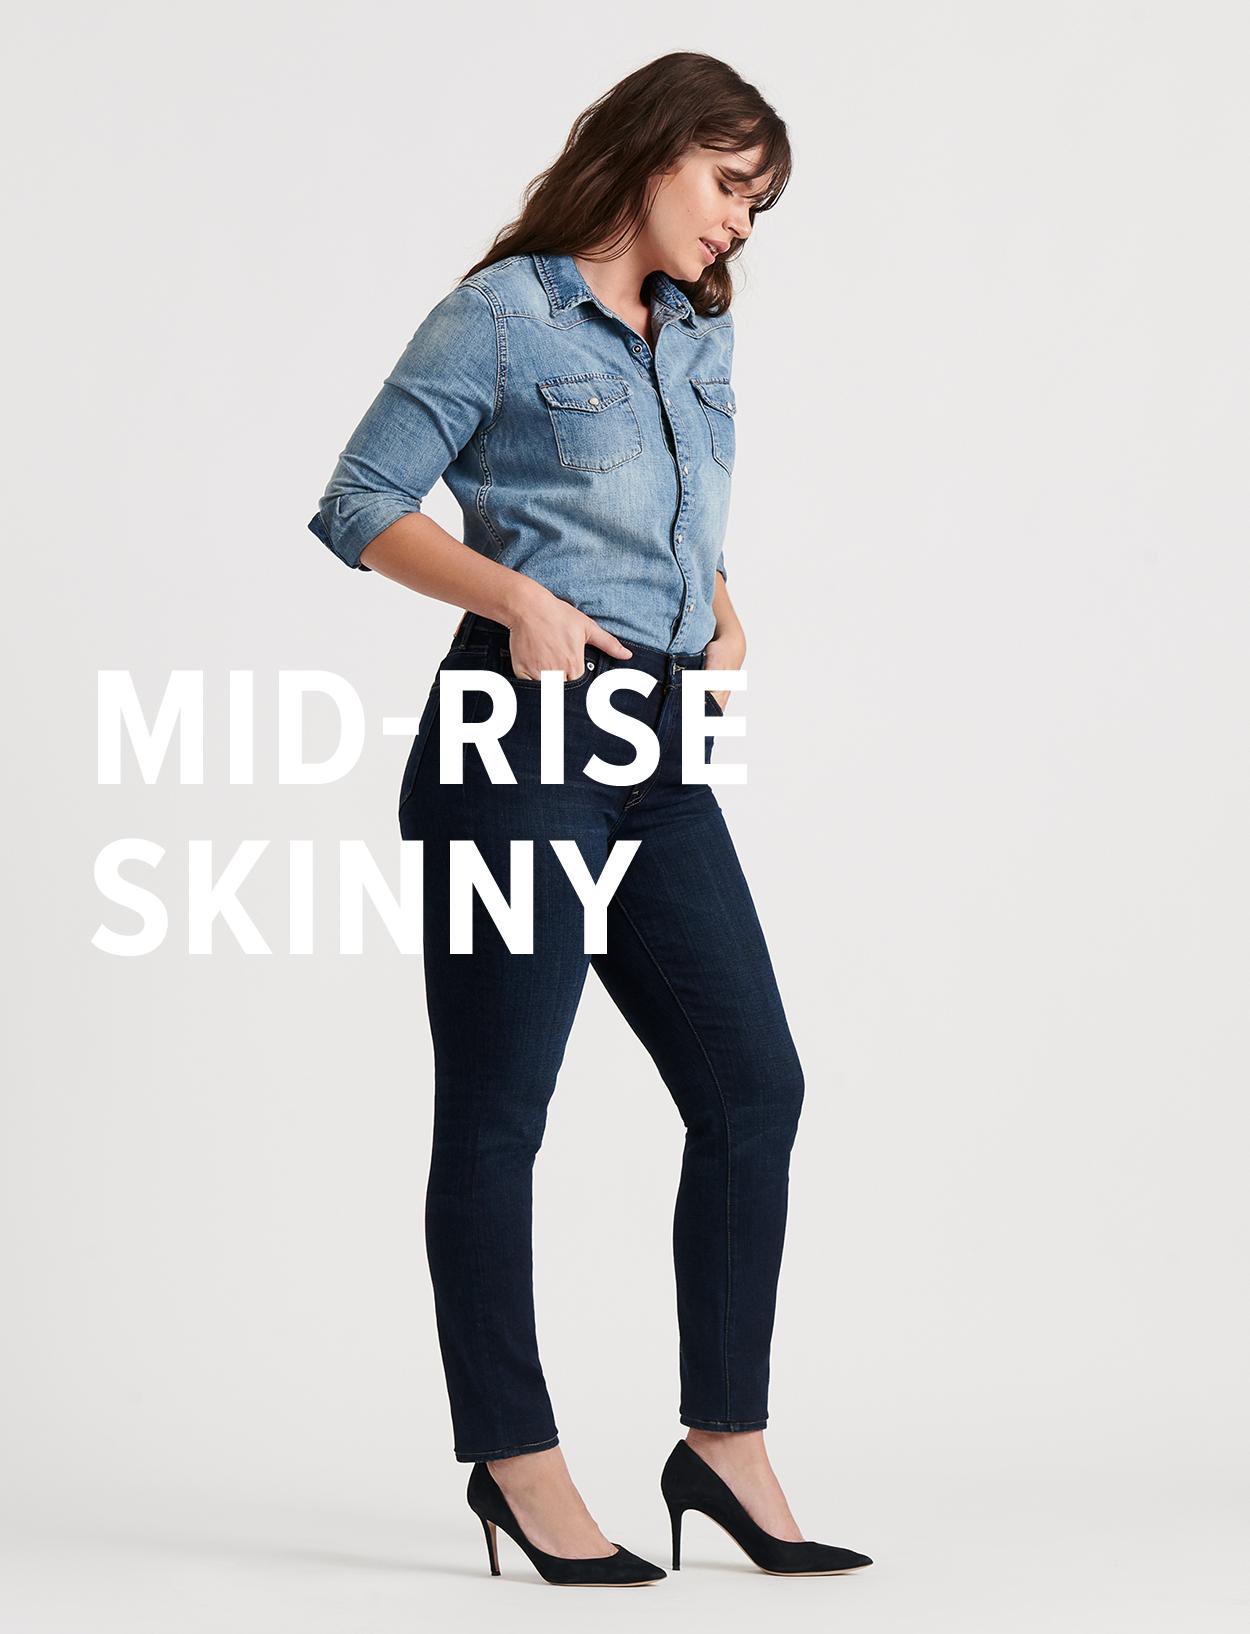 mid-rise skinny